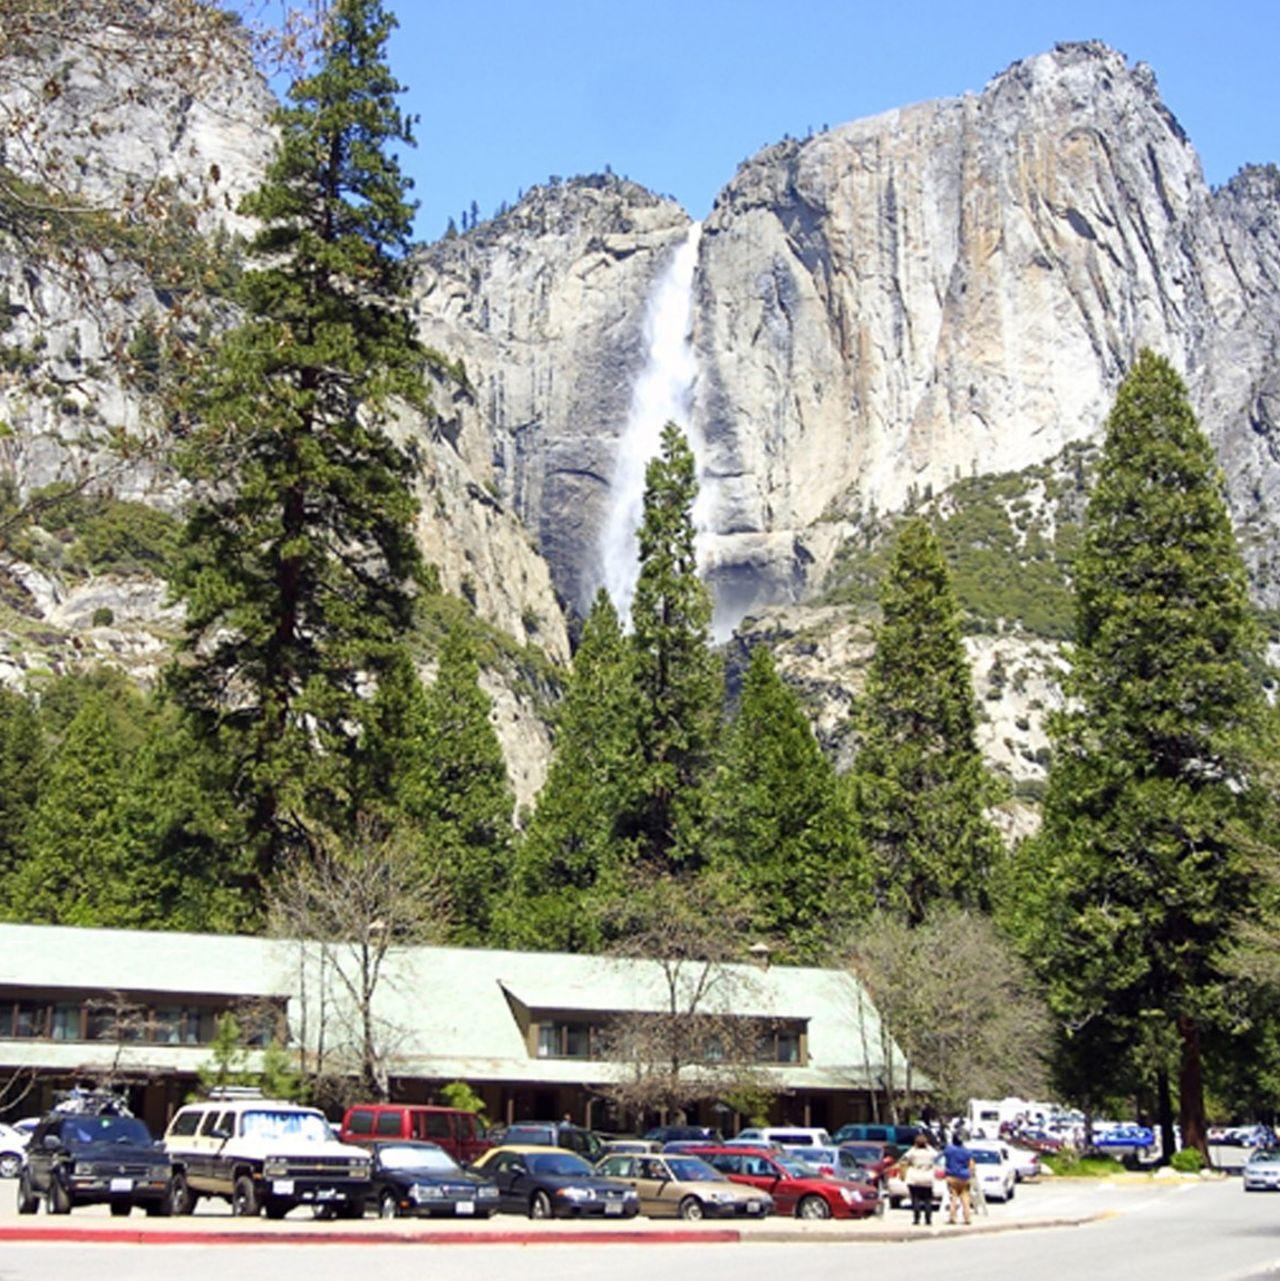 Hotel kalifornien yosemite park yosemite valley lodge for Yosemite valley cabins